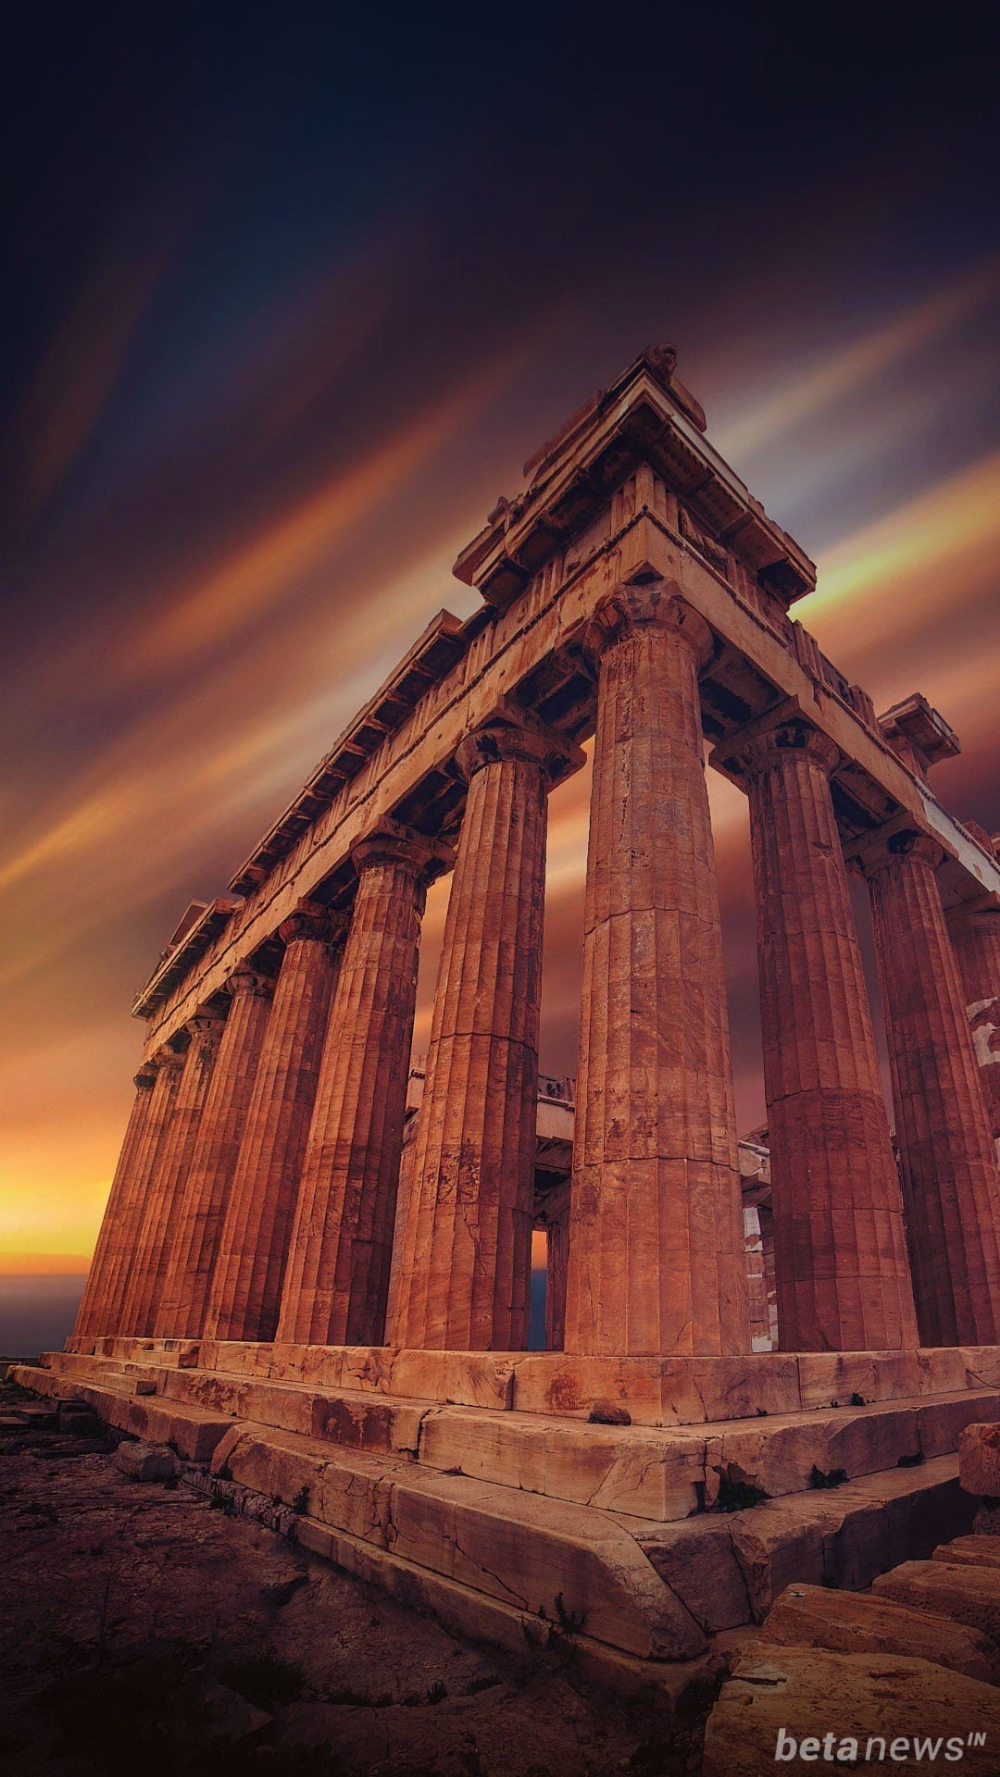 The Acropolis Wallpaper Greece World 101 Wallpapers Hd Wallpapers 4k Xiaomi Wallpapers Architecture Wallpaper Apple Wallpaper Iphone